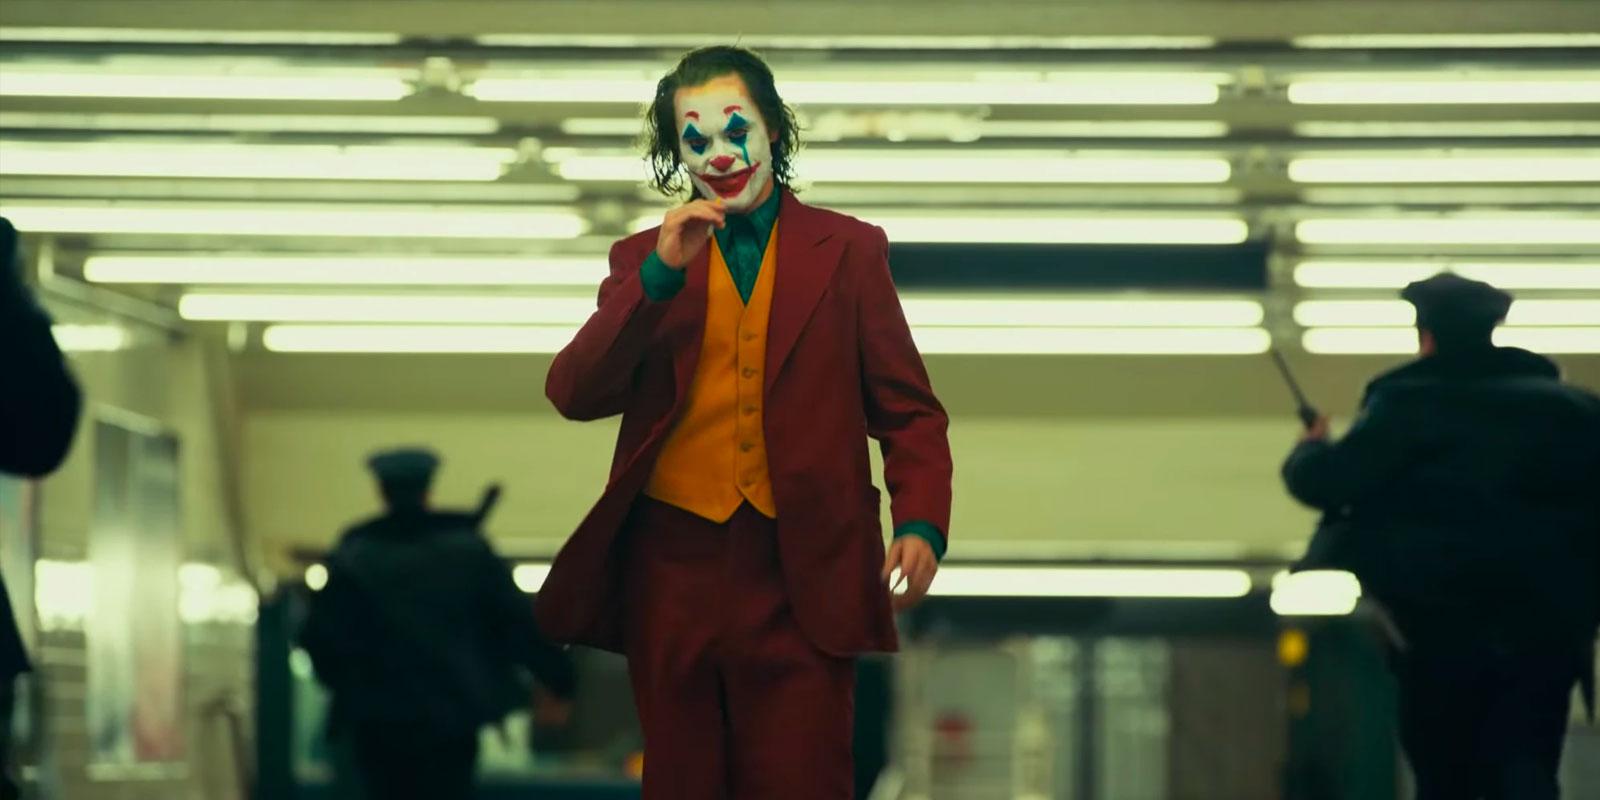 Джокер (2019) Joker